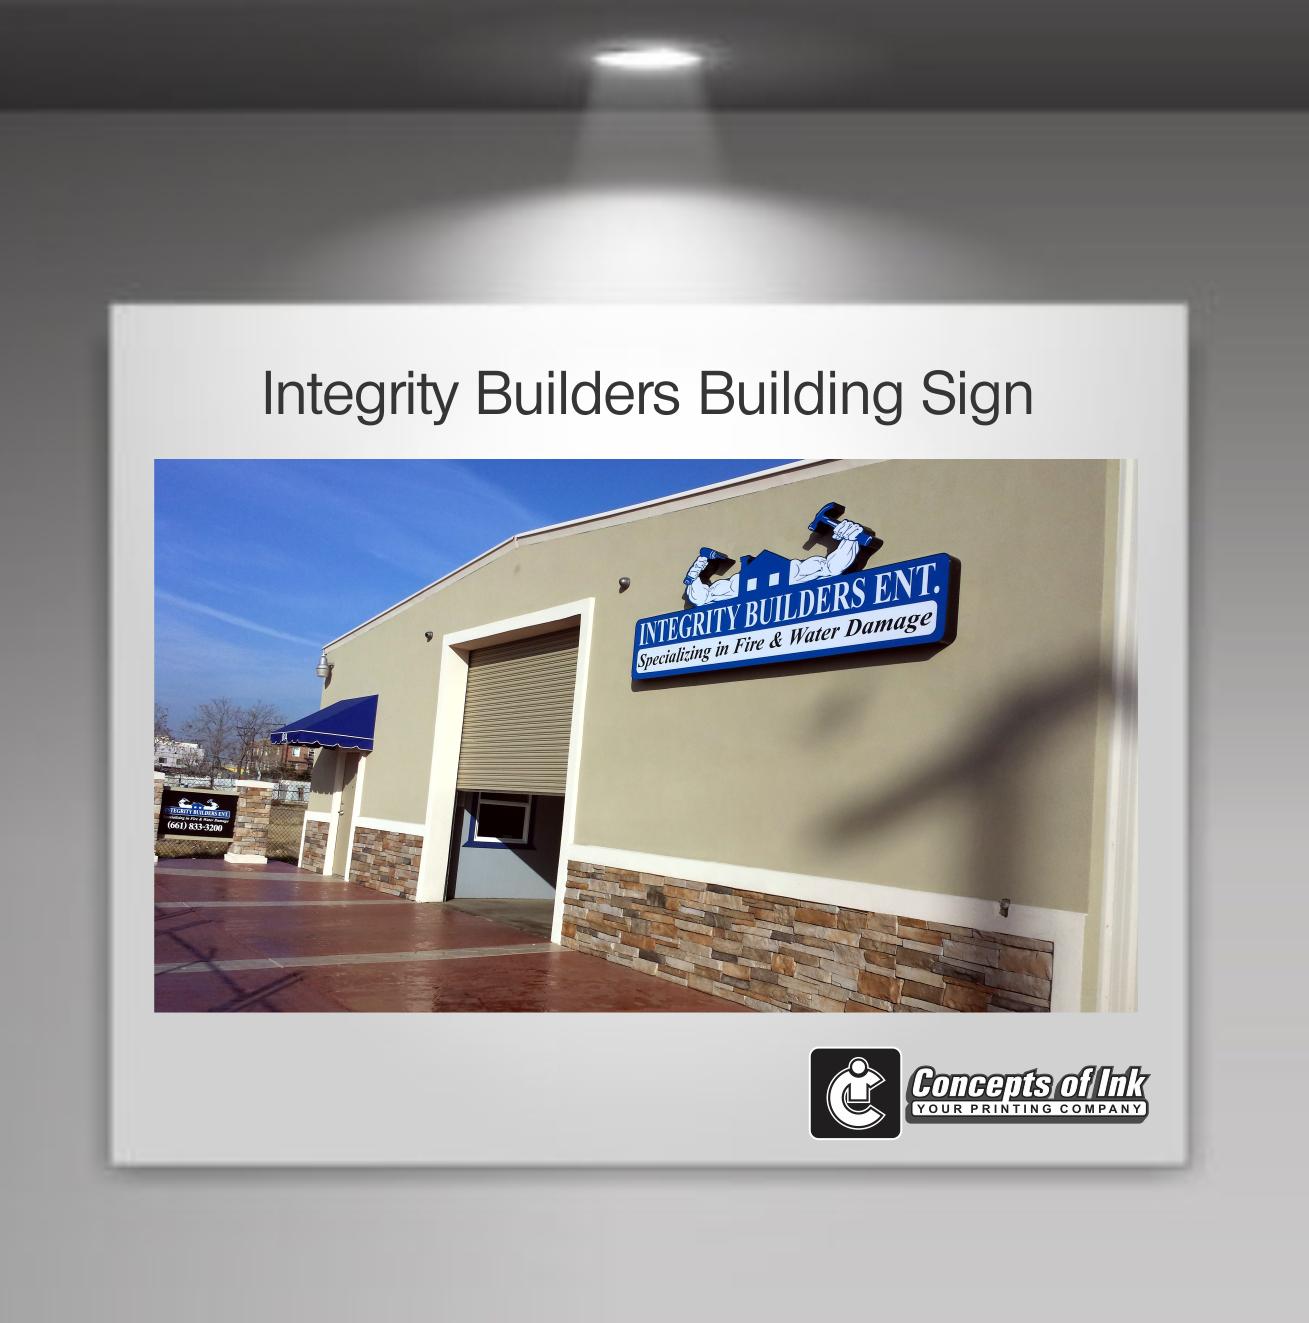 Integrity Builders